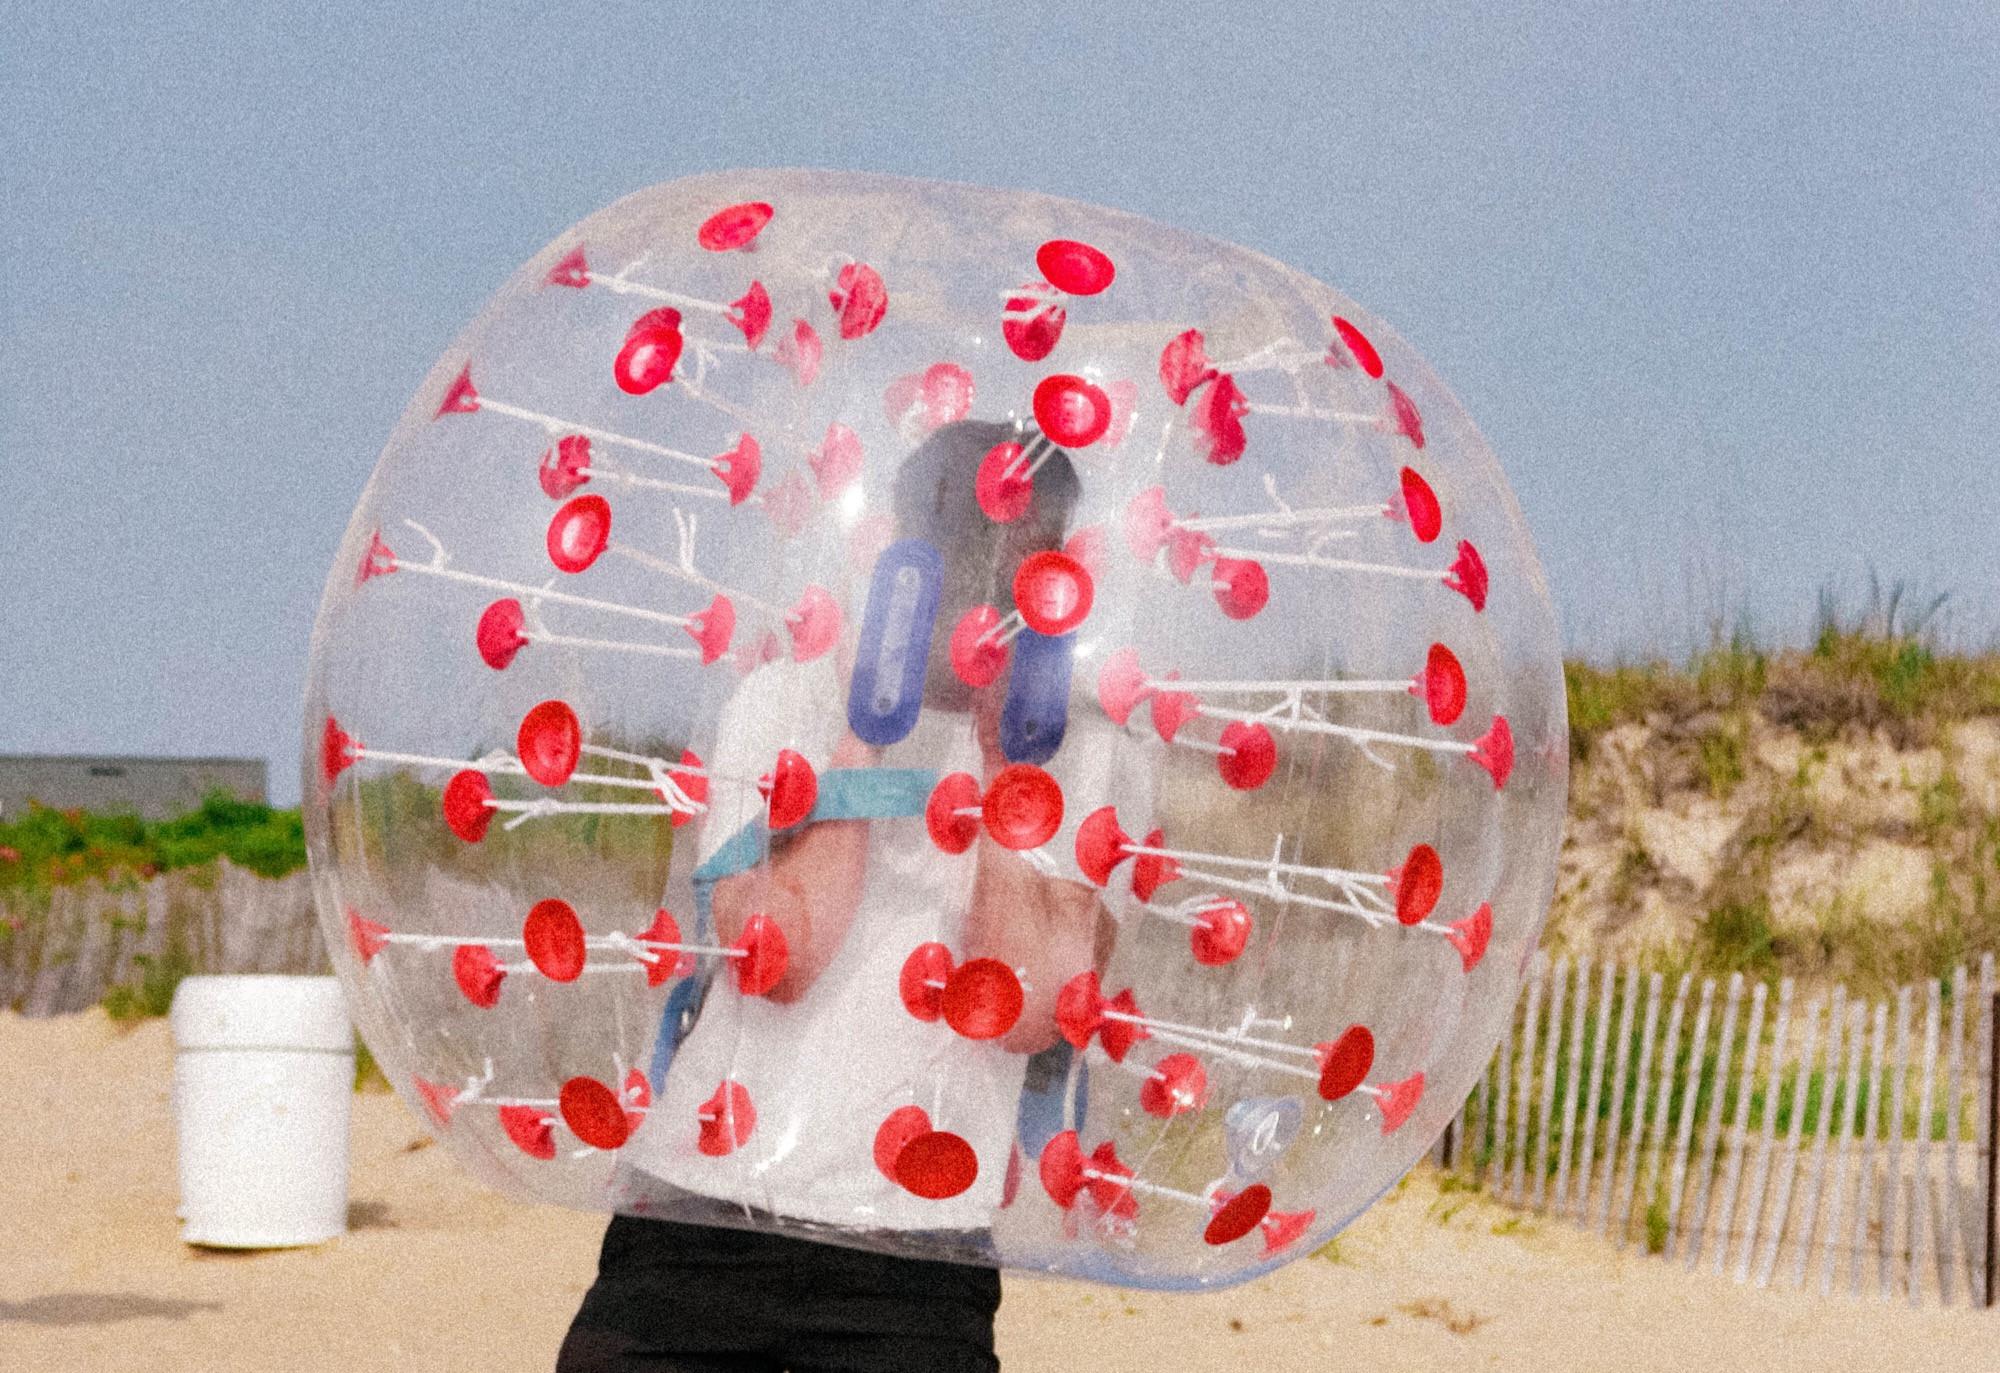 6 Giant Bubble Balls